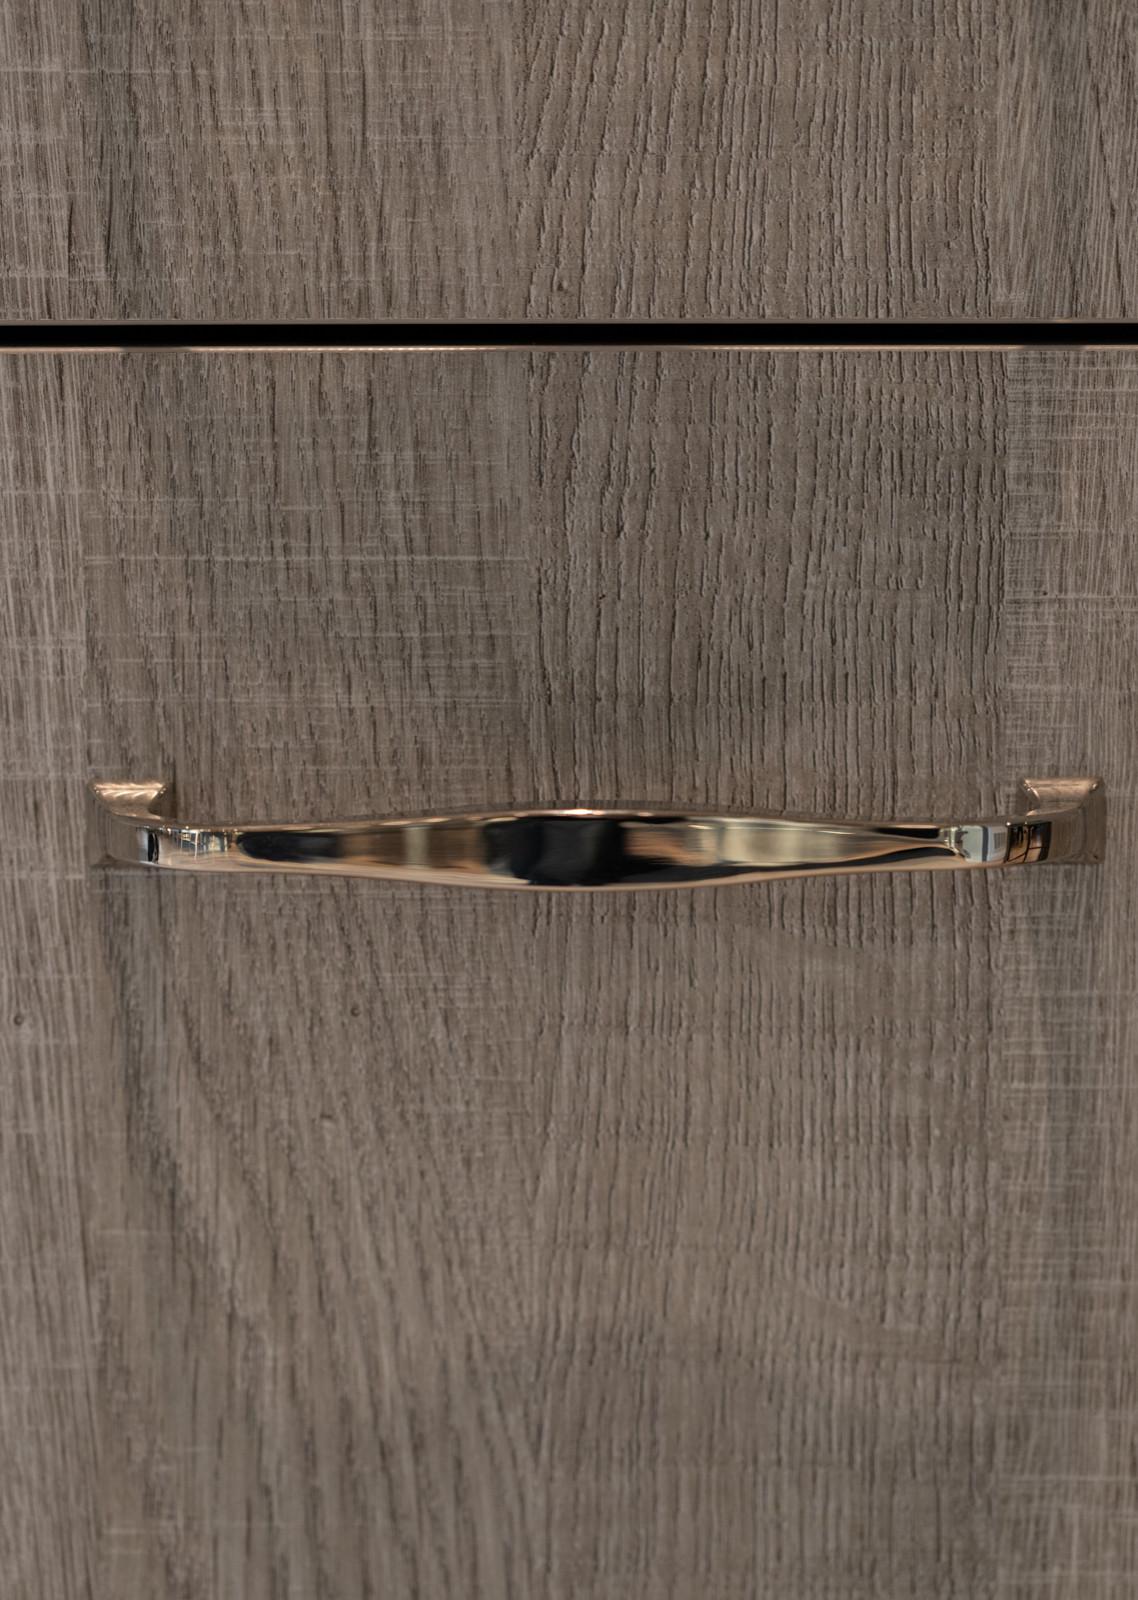 wood grain vertically matched door to drawer